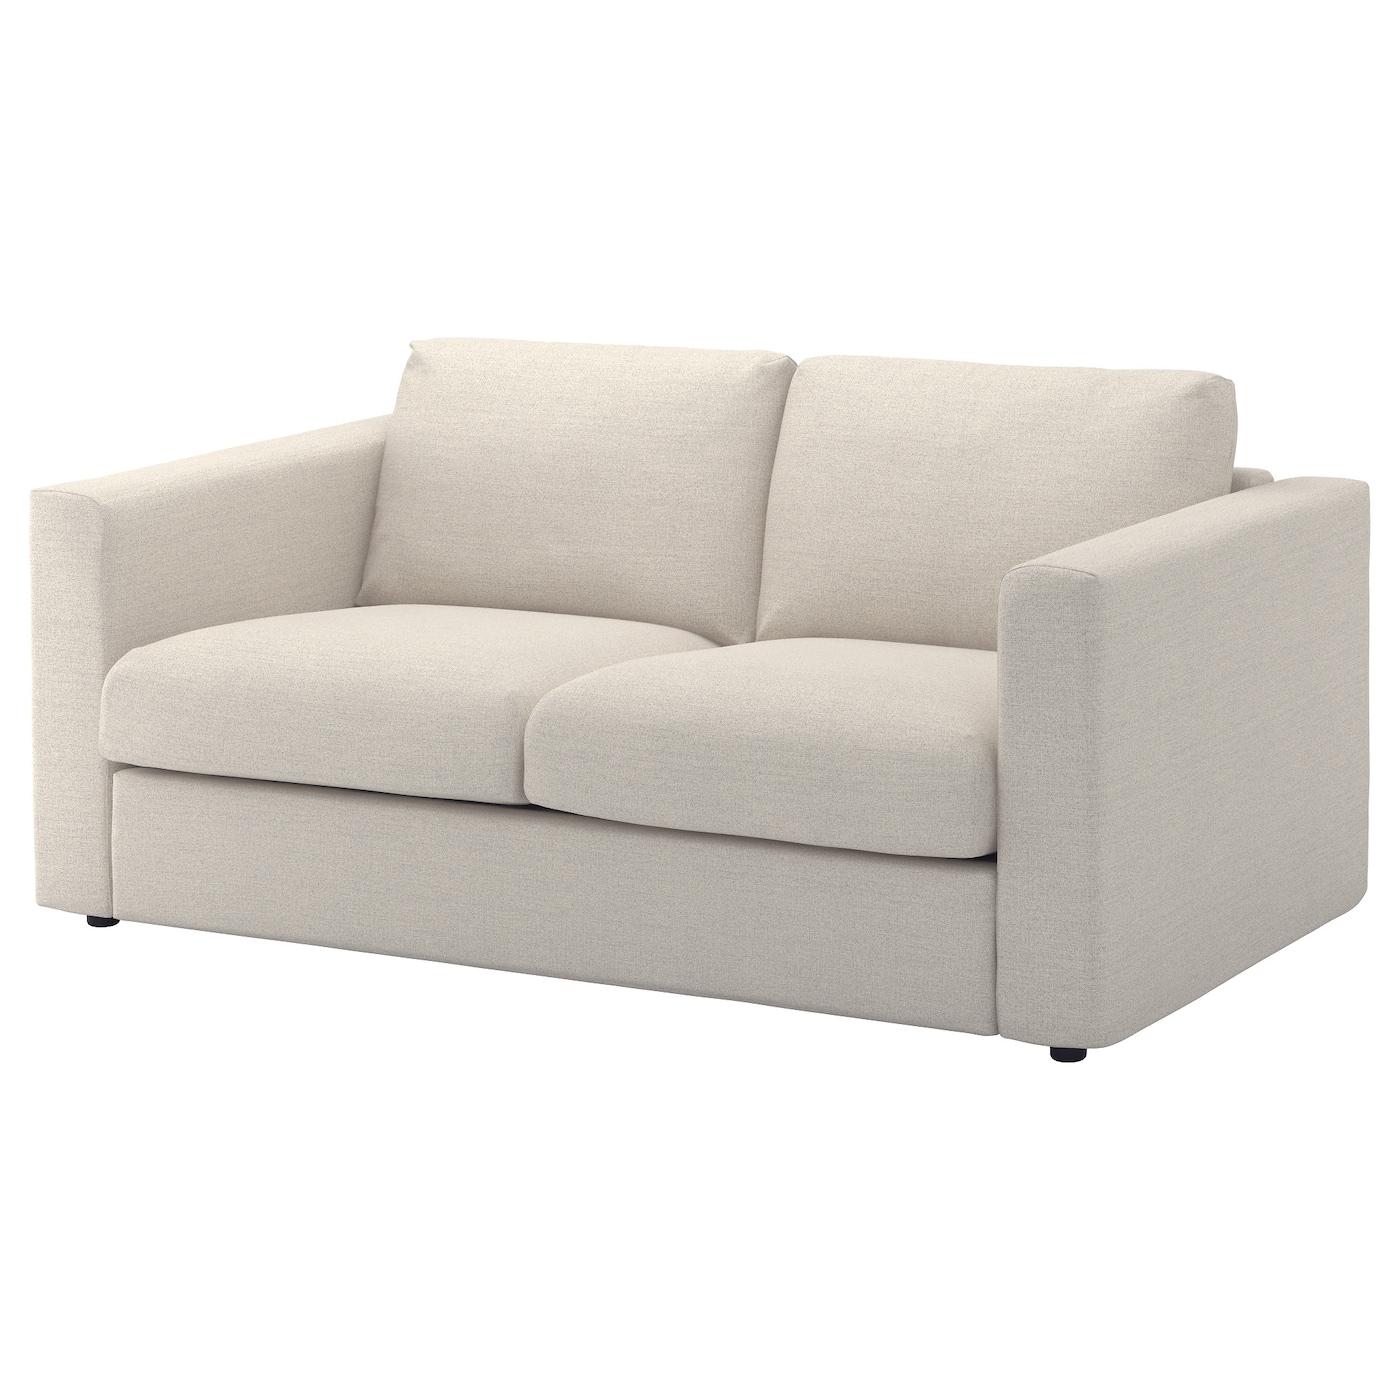 VIMLE 2 sitssoffa, Gunnared beige IKEA